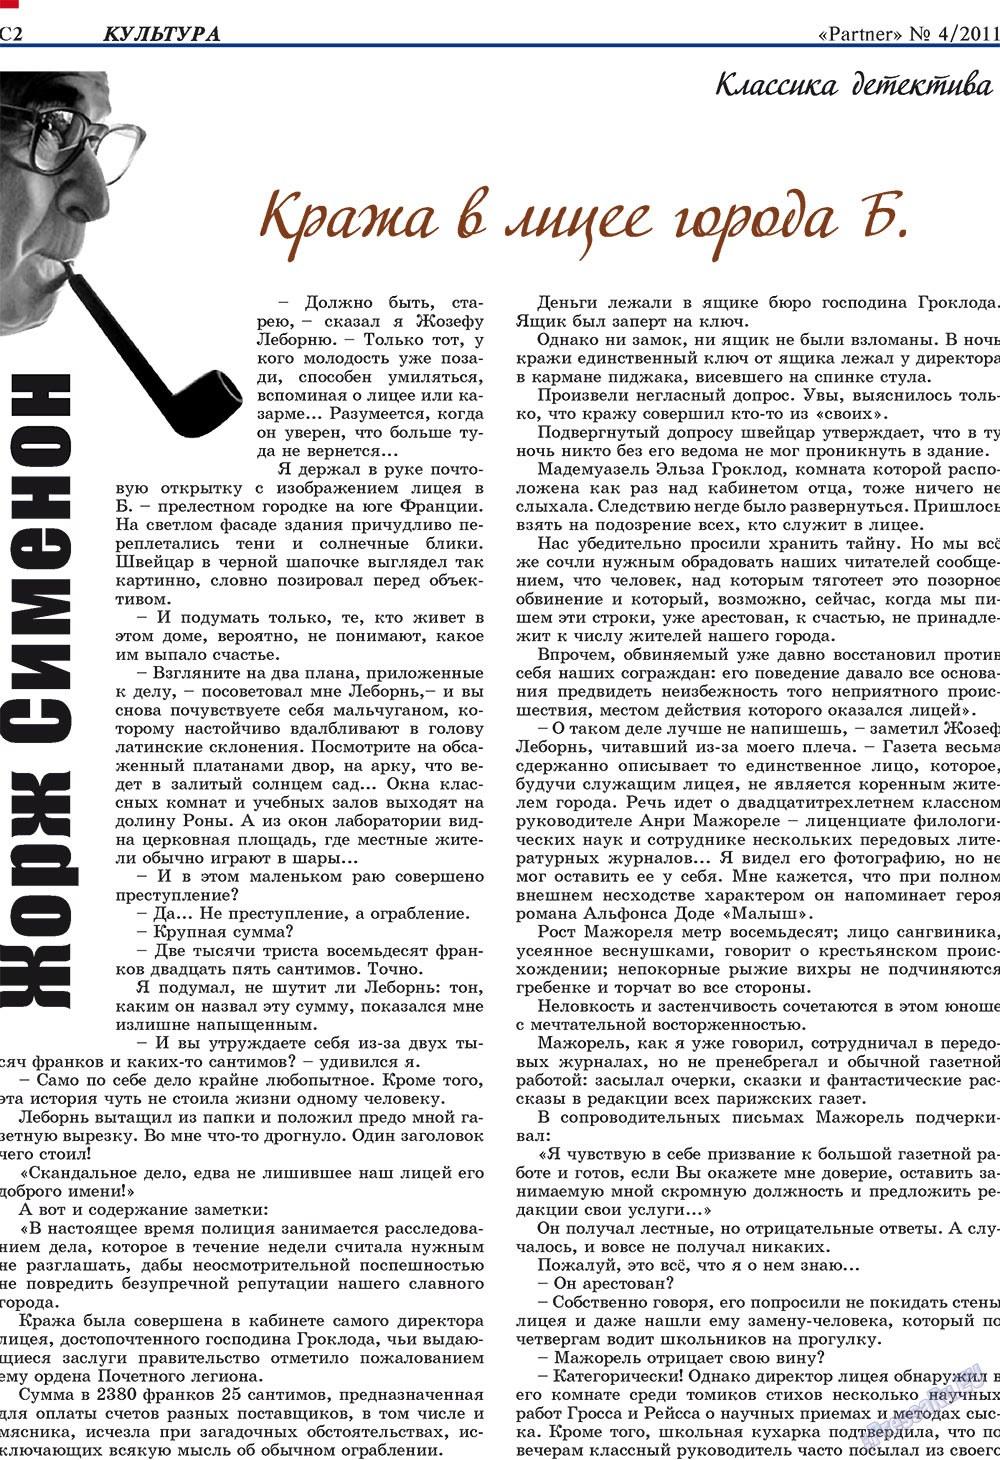 Партнер-север (журнал). 2011 год, номер 4, стр. 60